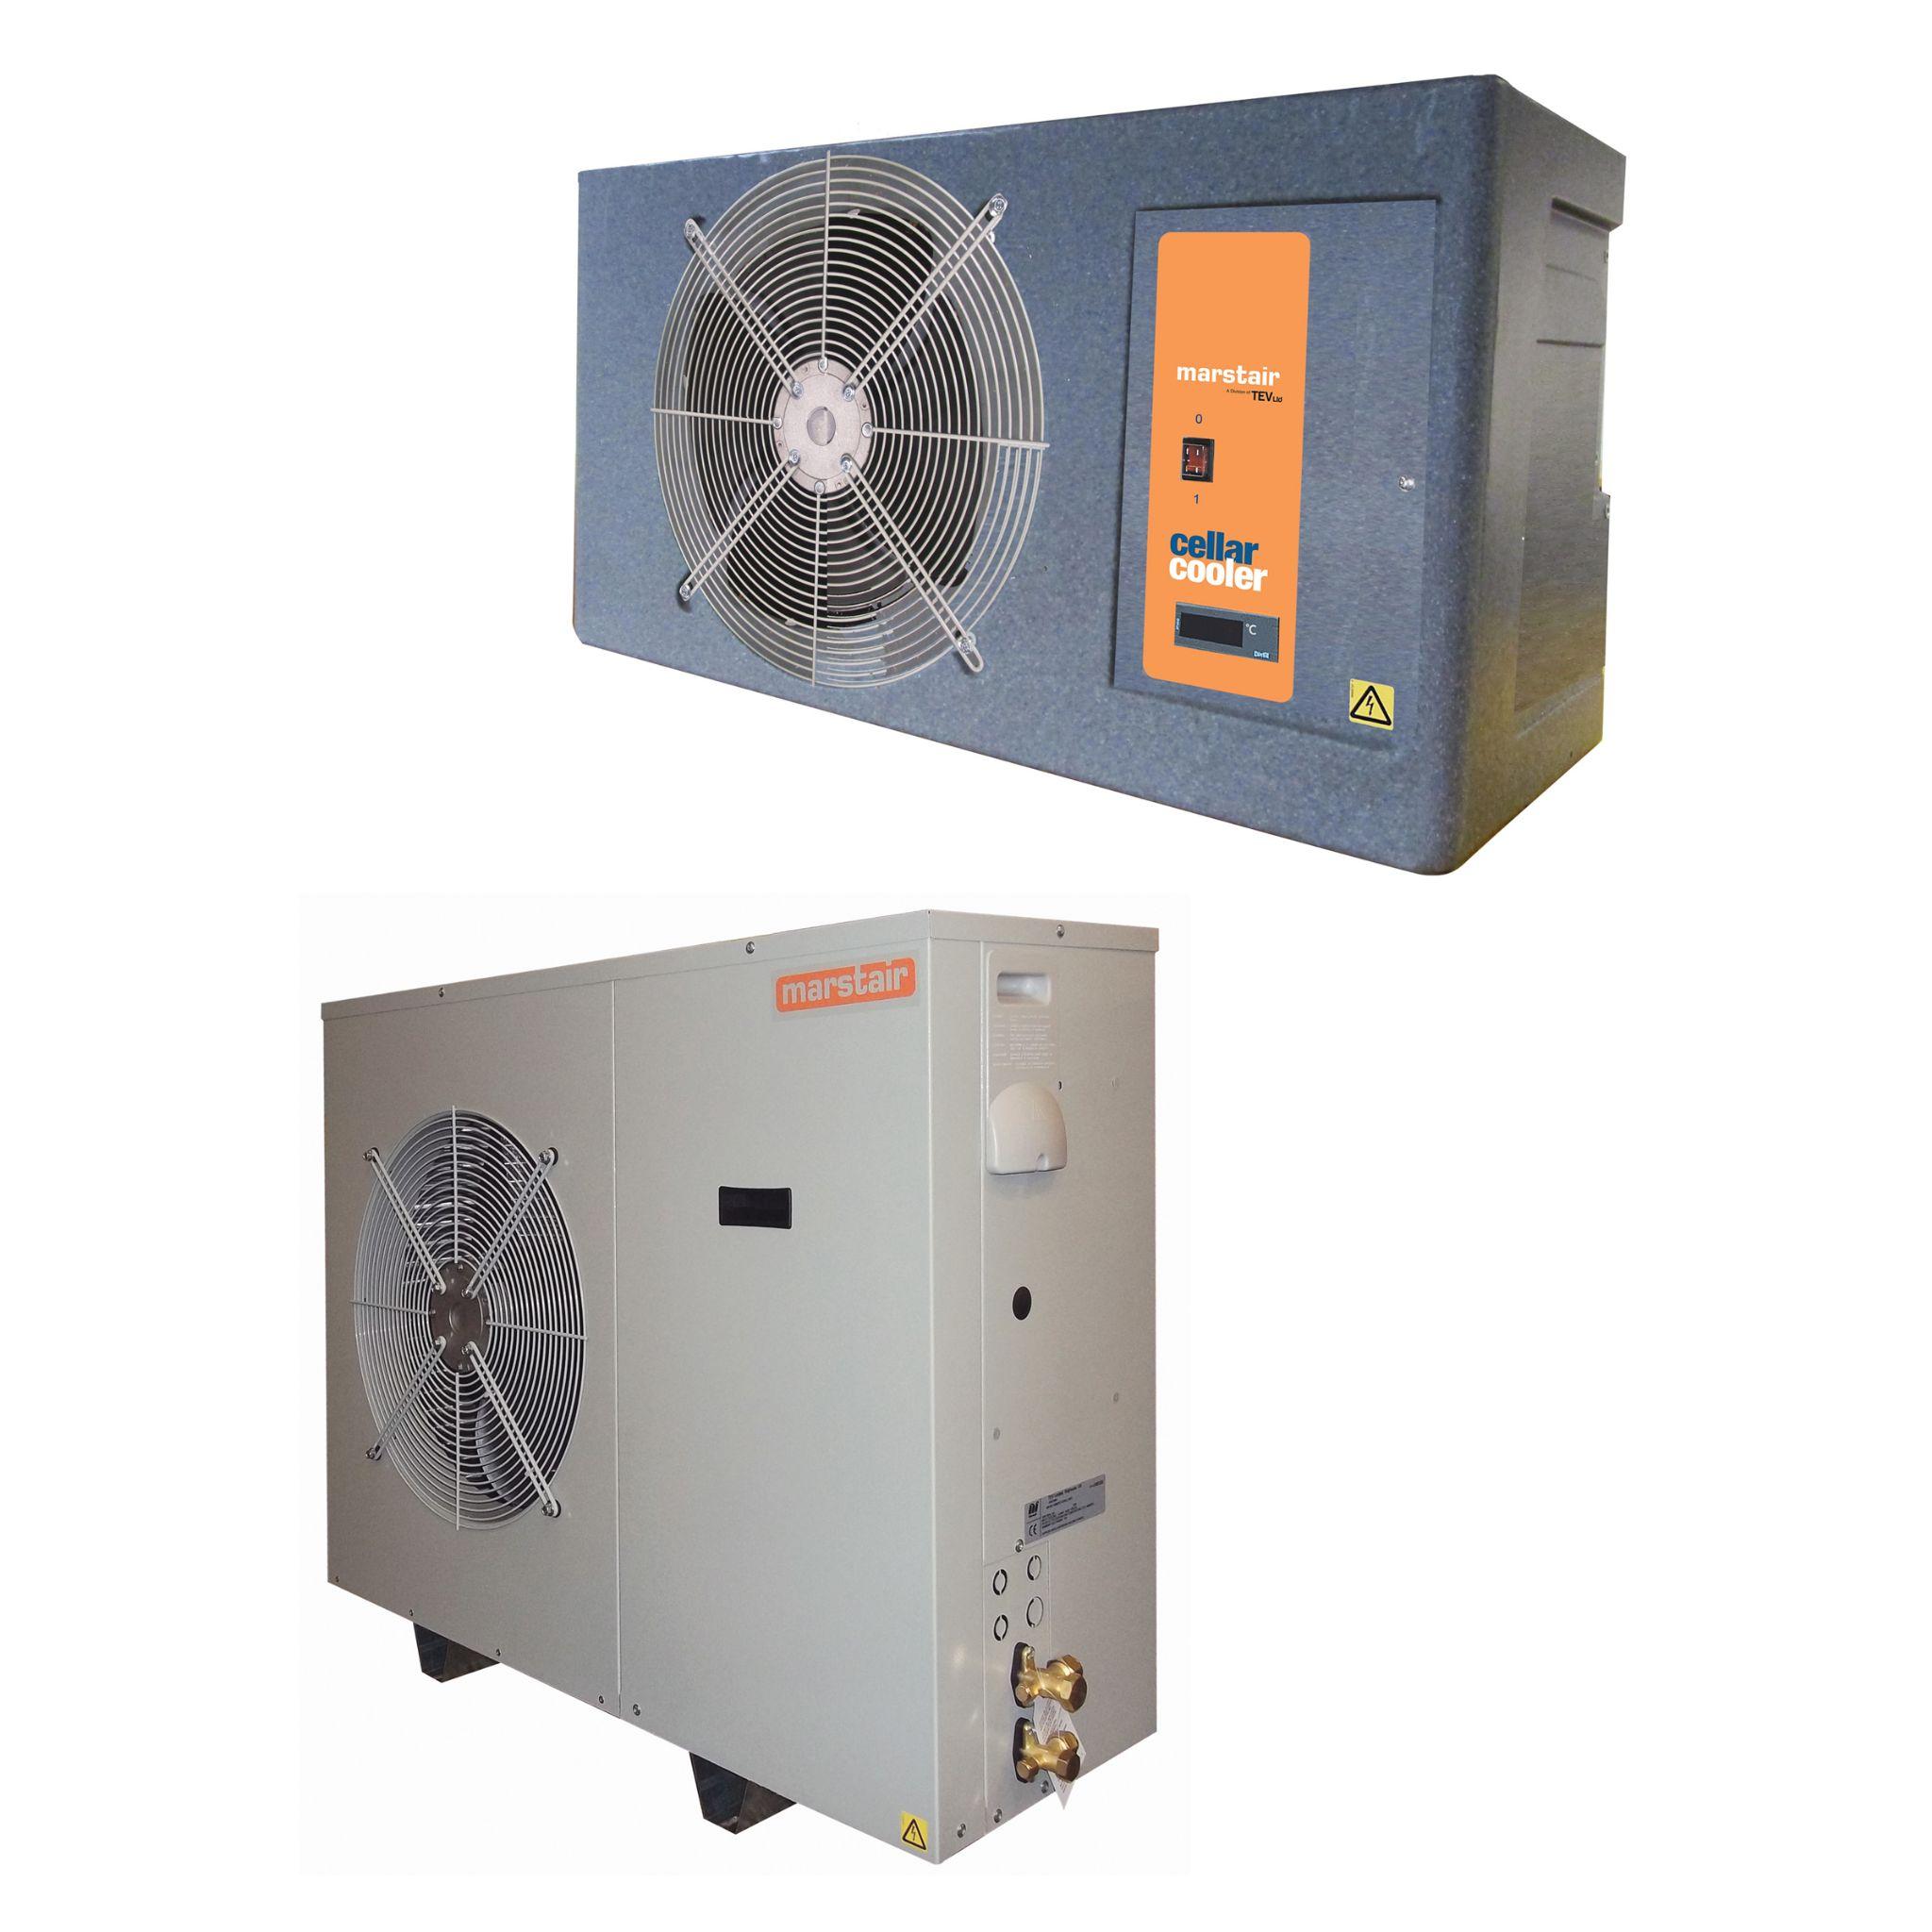 Marstair Cellarator Cx50 Cellar Cooling Complete System 4